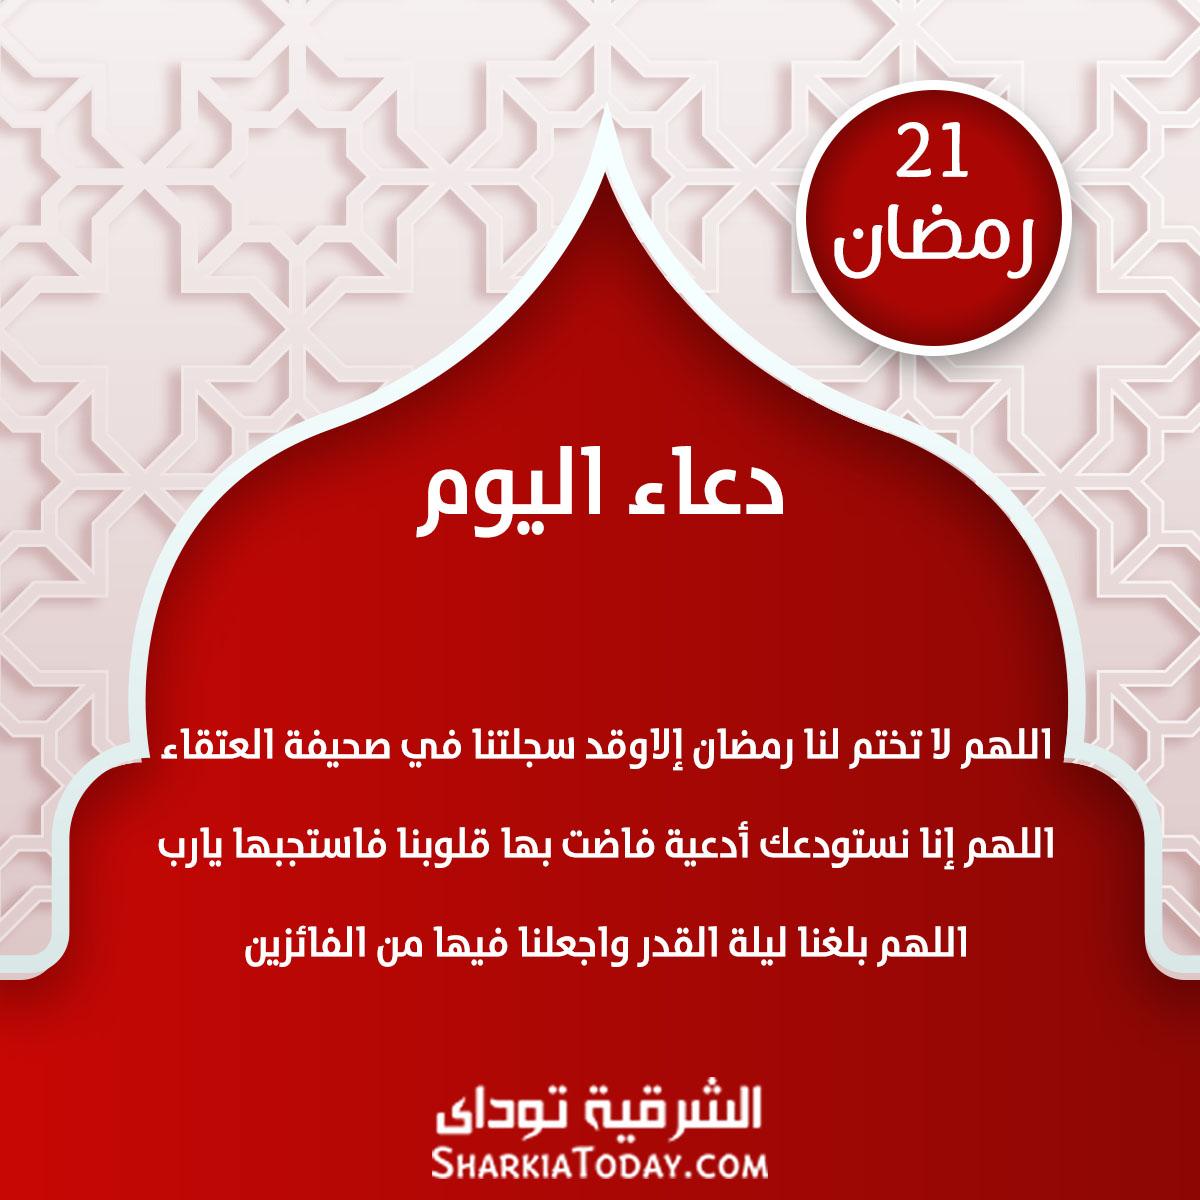 دعاء 21 رمضان الشرقية توداي